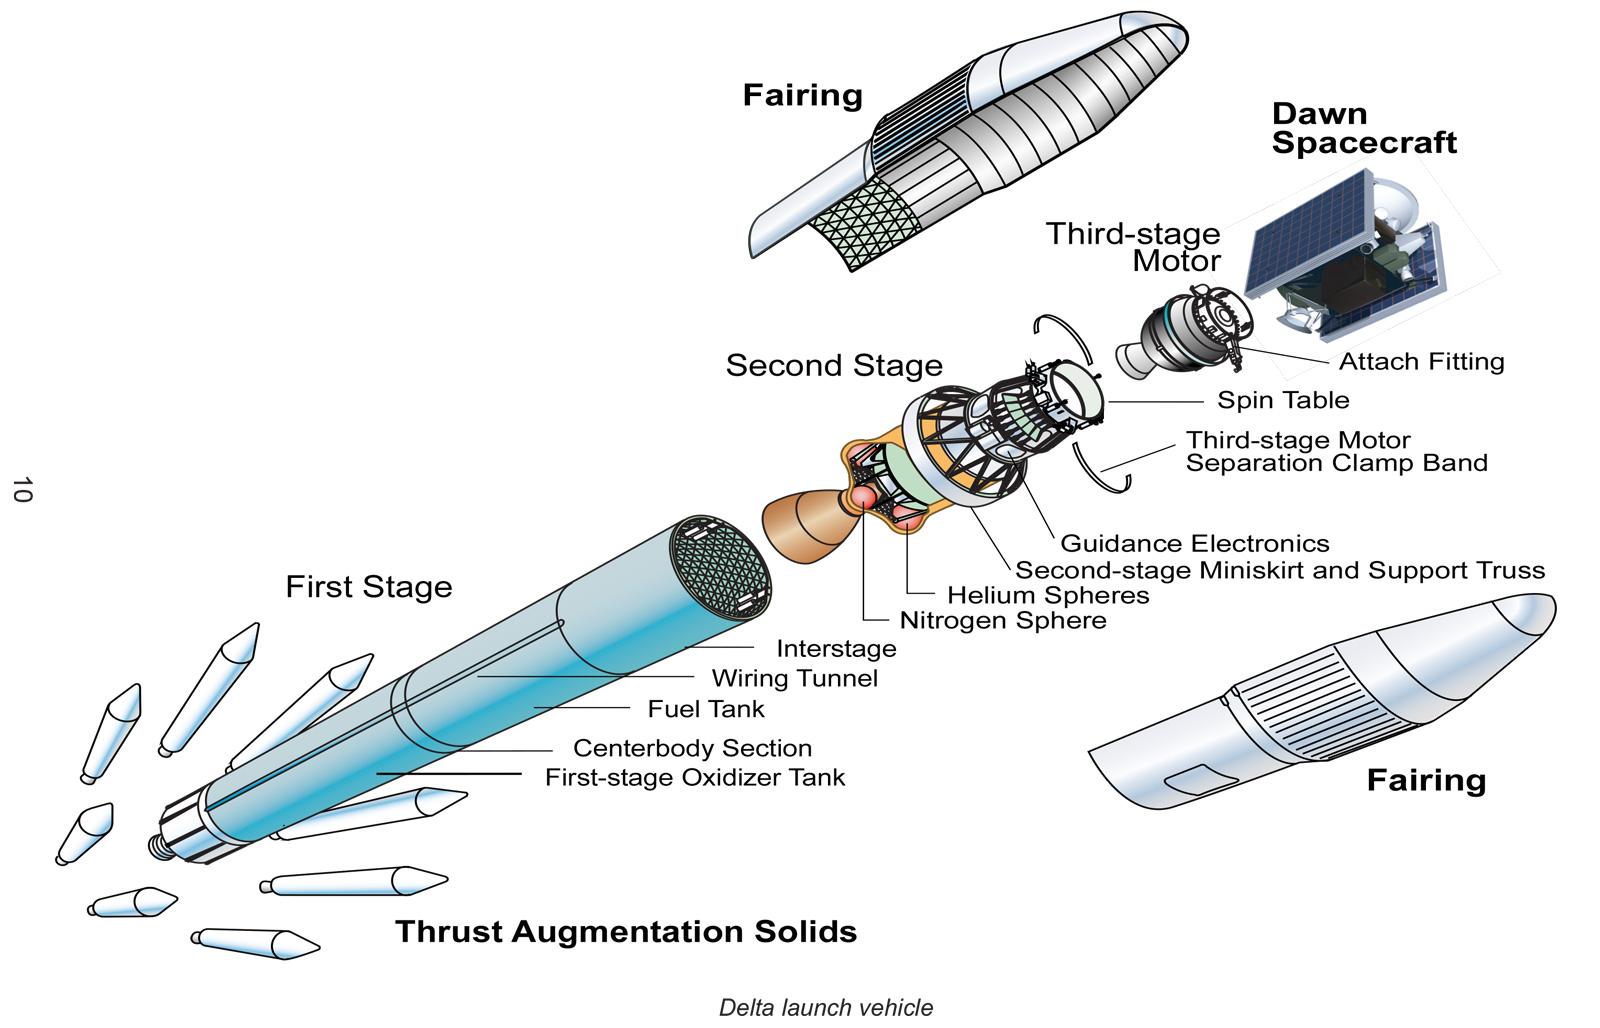 Dawn Launch Vehicle Diagram